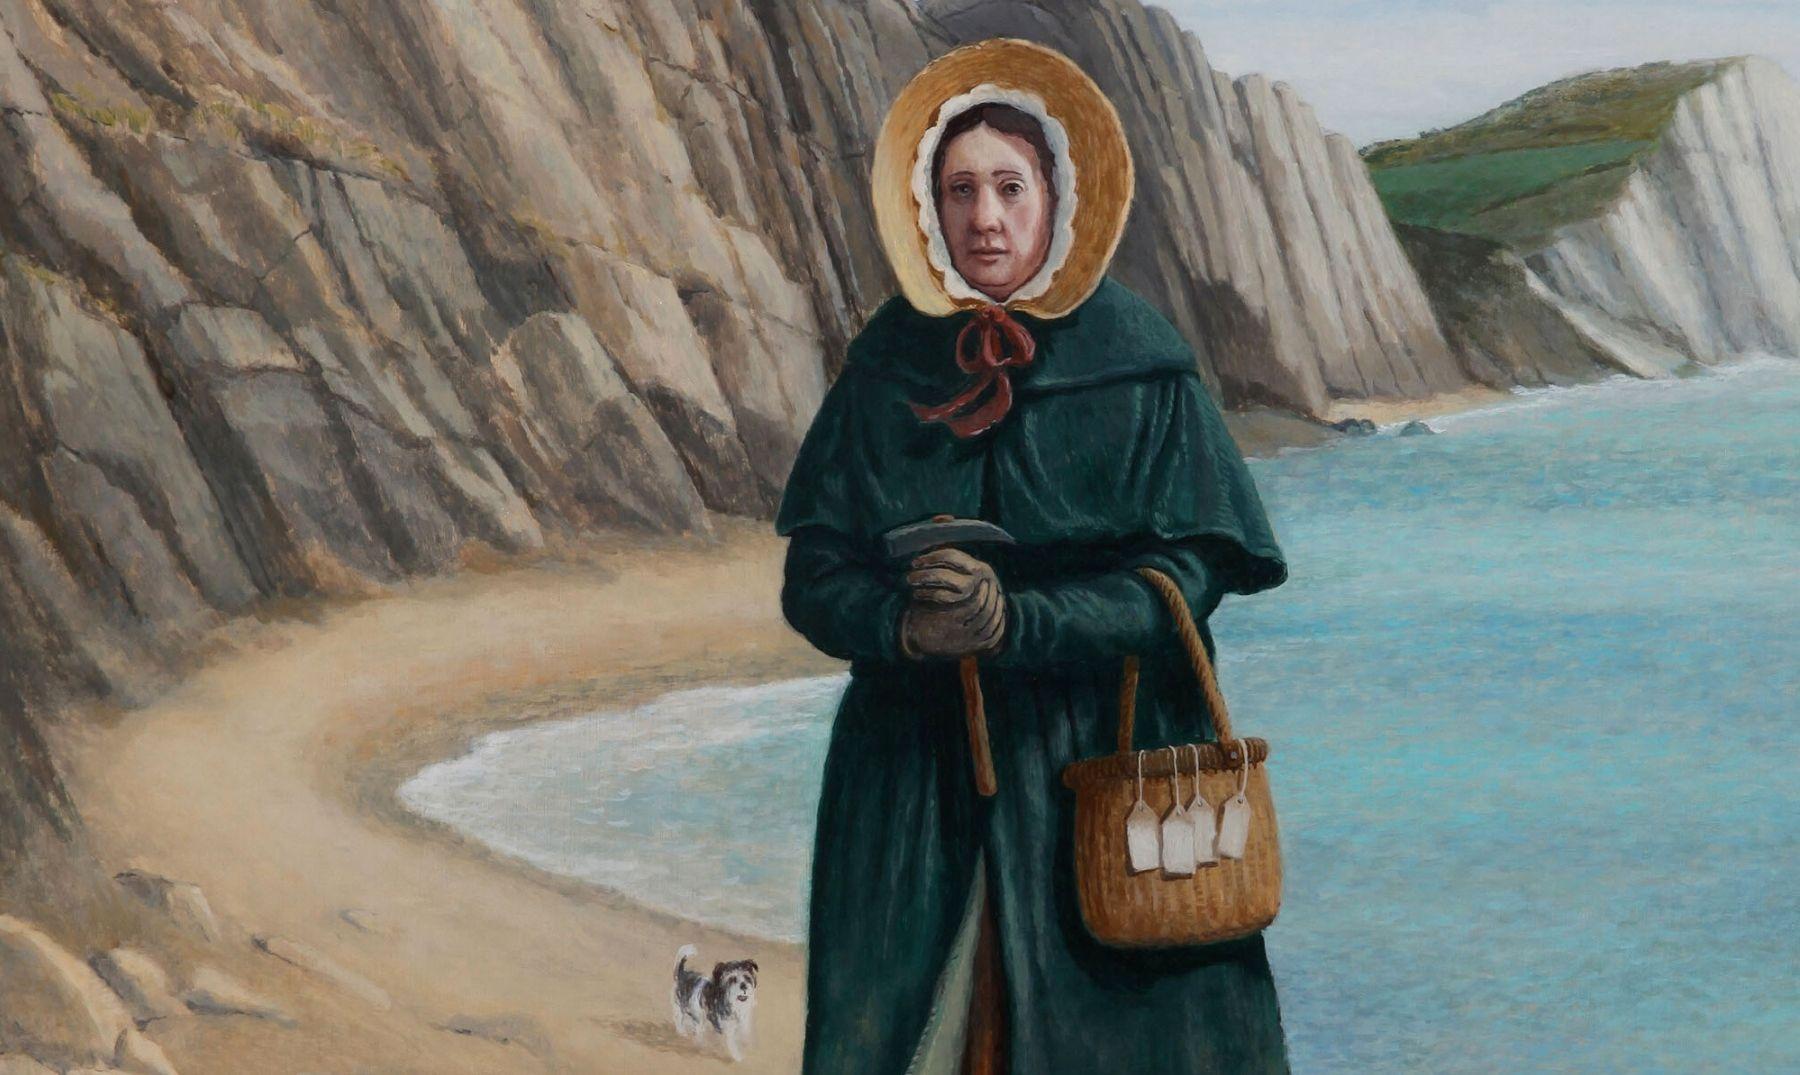 Mary Anning | La primera paleontóloga reconocida